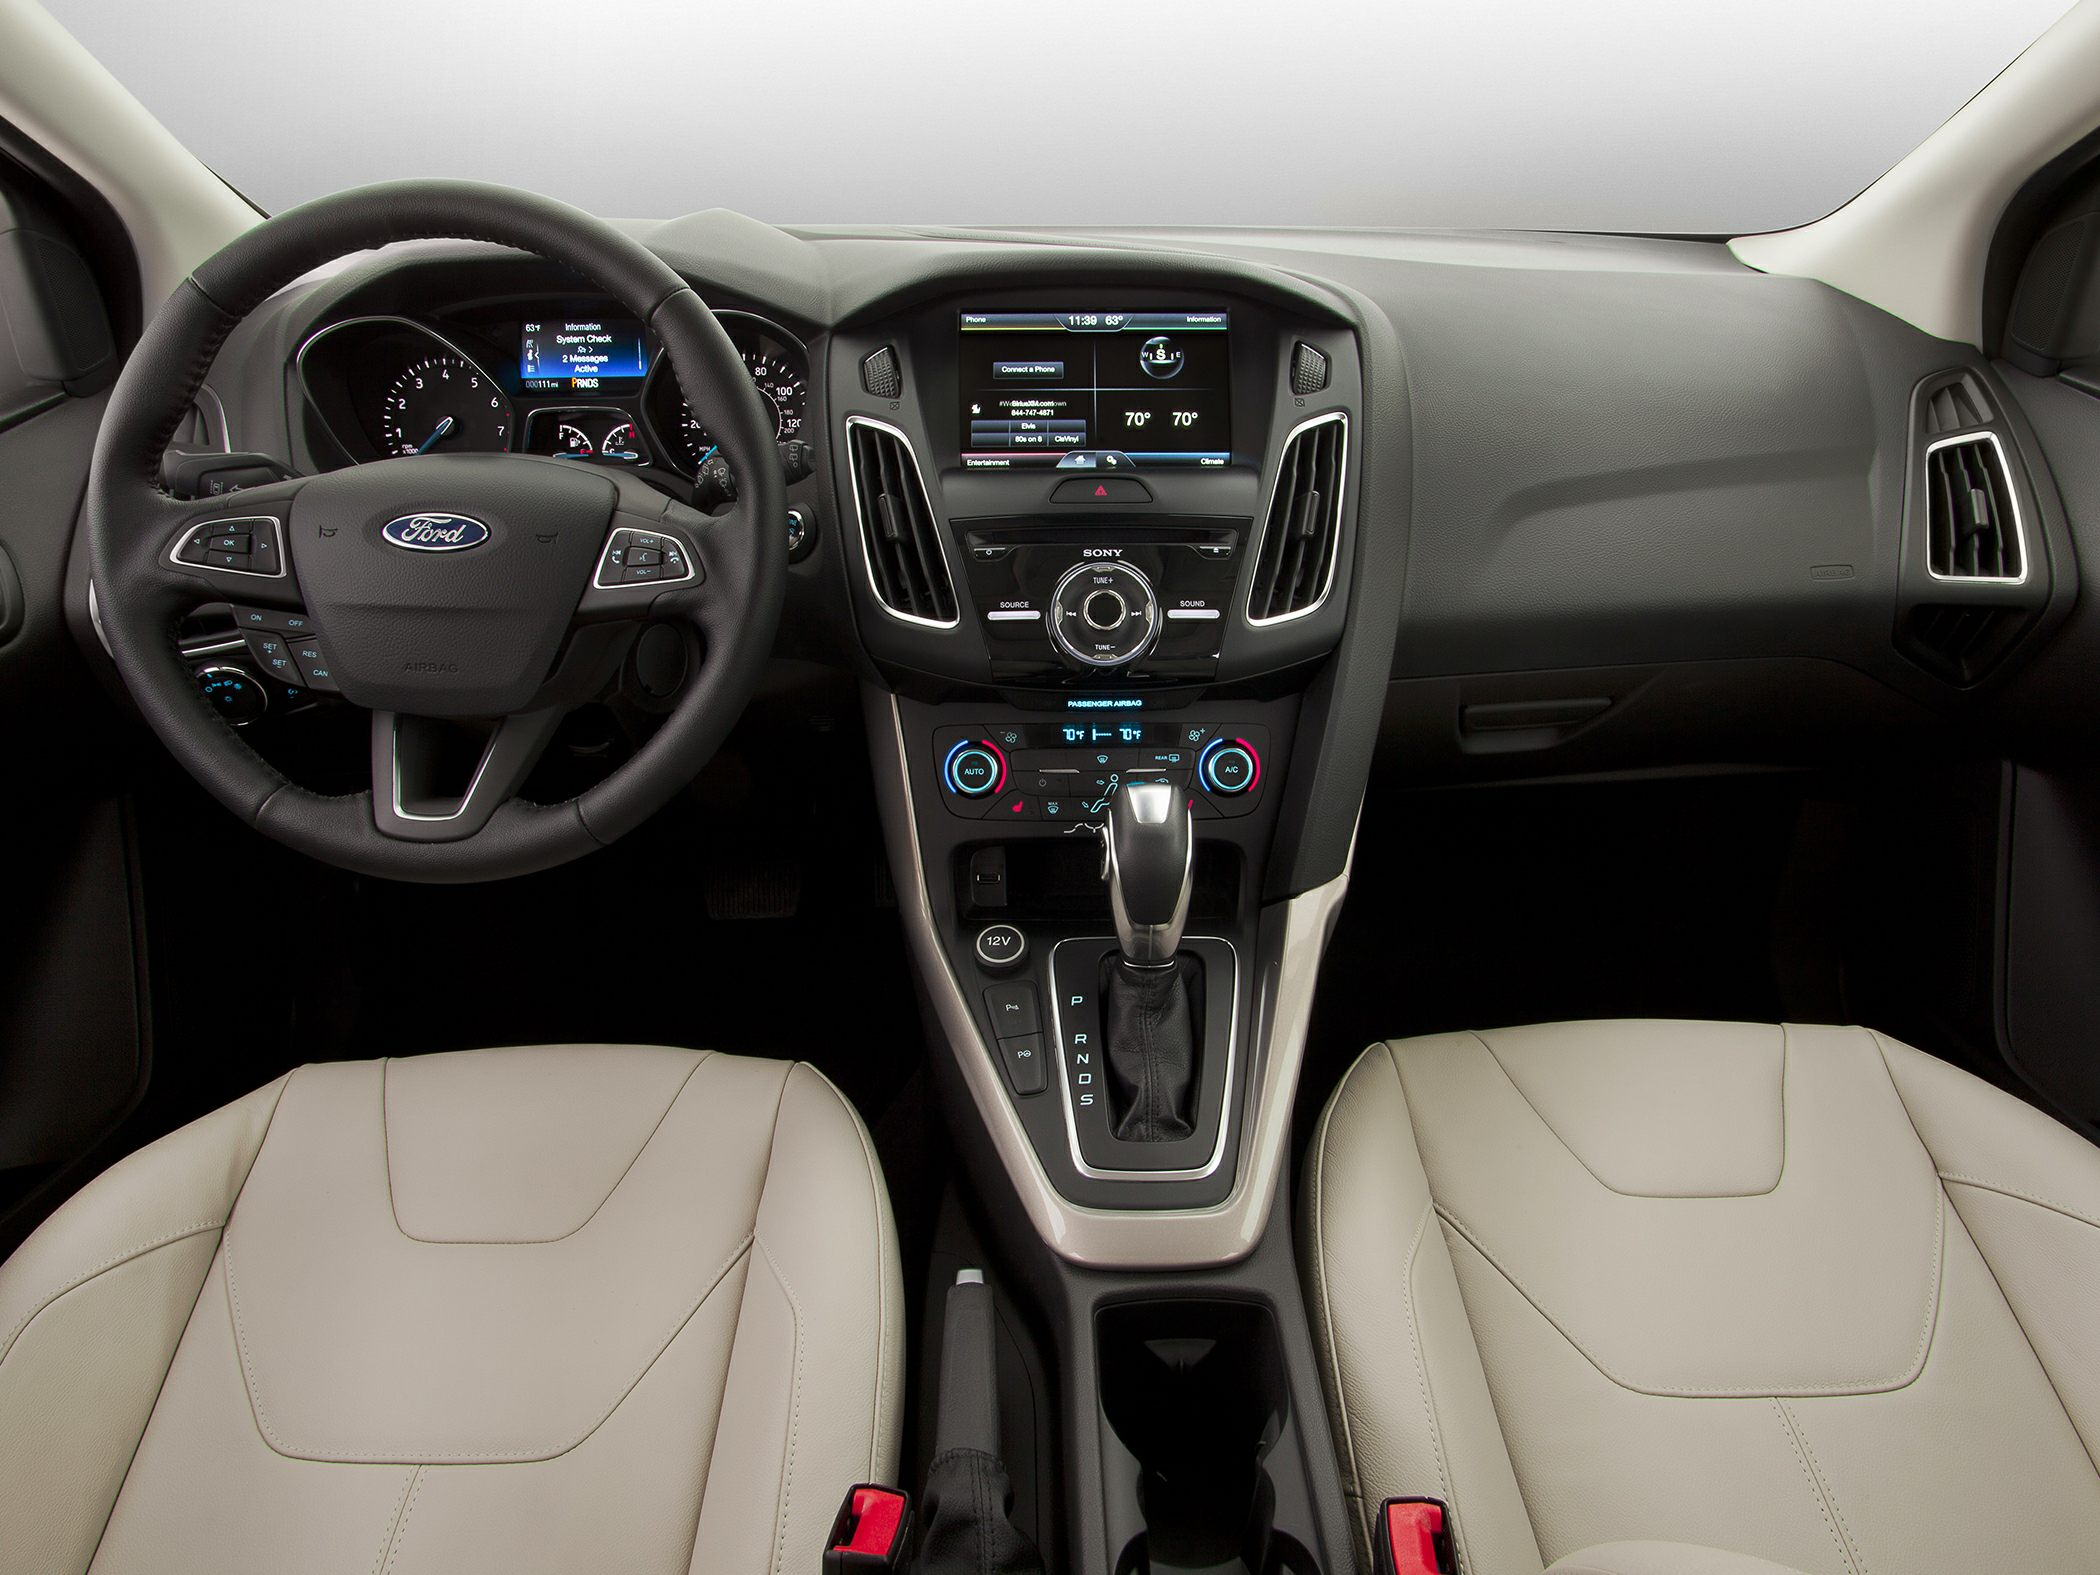 2017 Ford Focus 4d Sedan Se Melloy Ford Los Lunas New Mexico